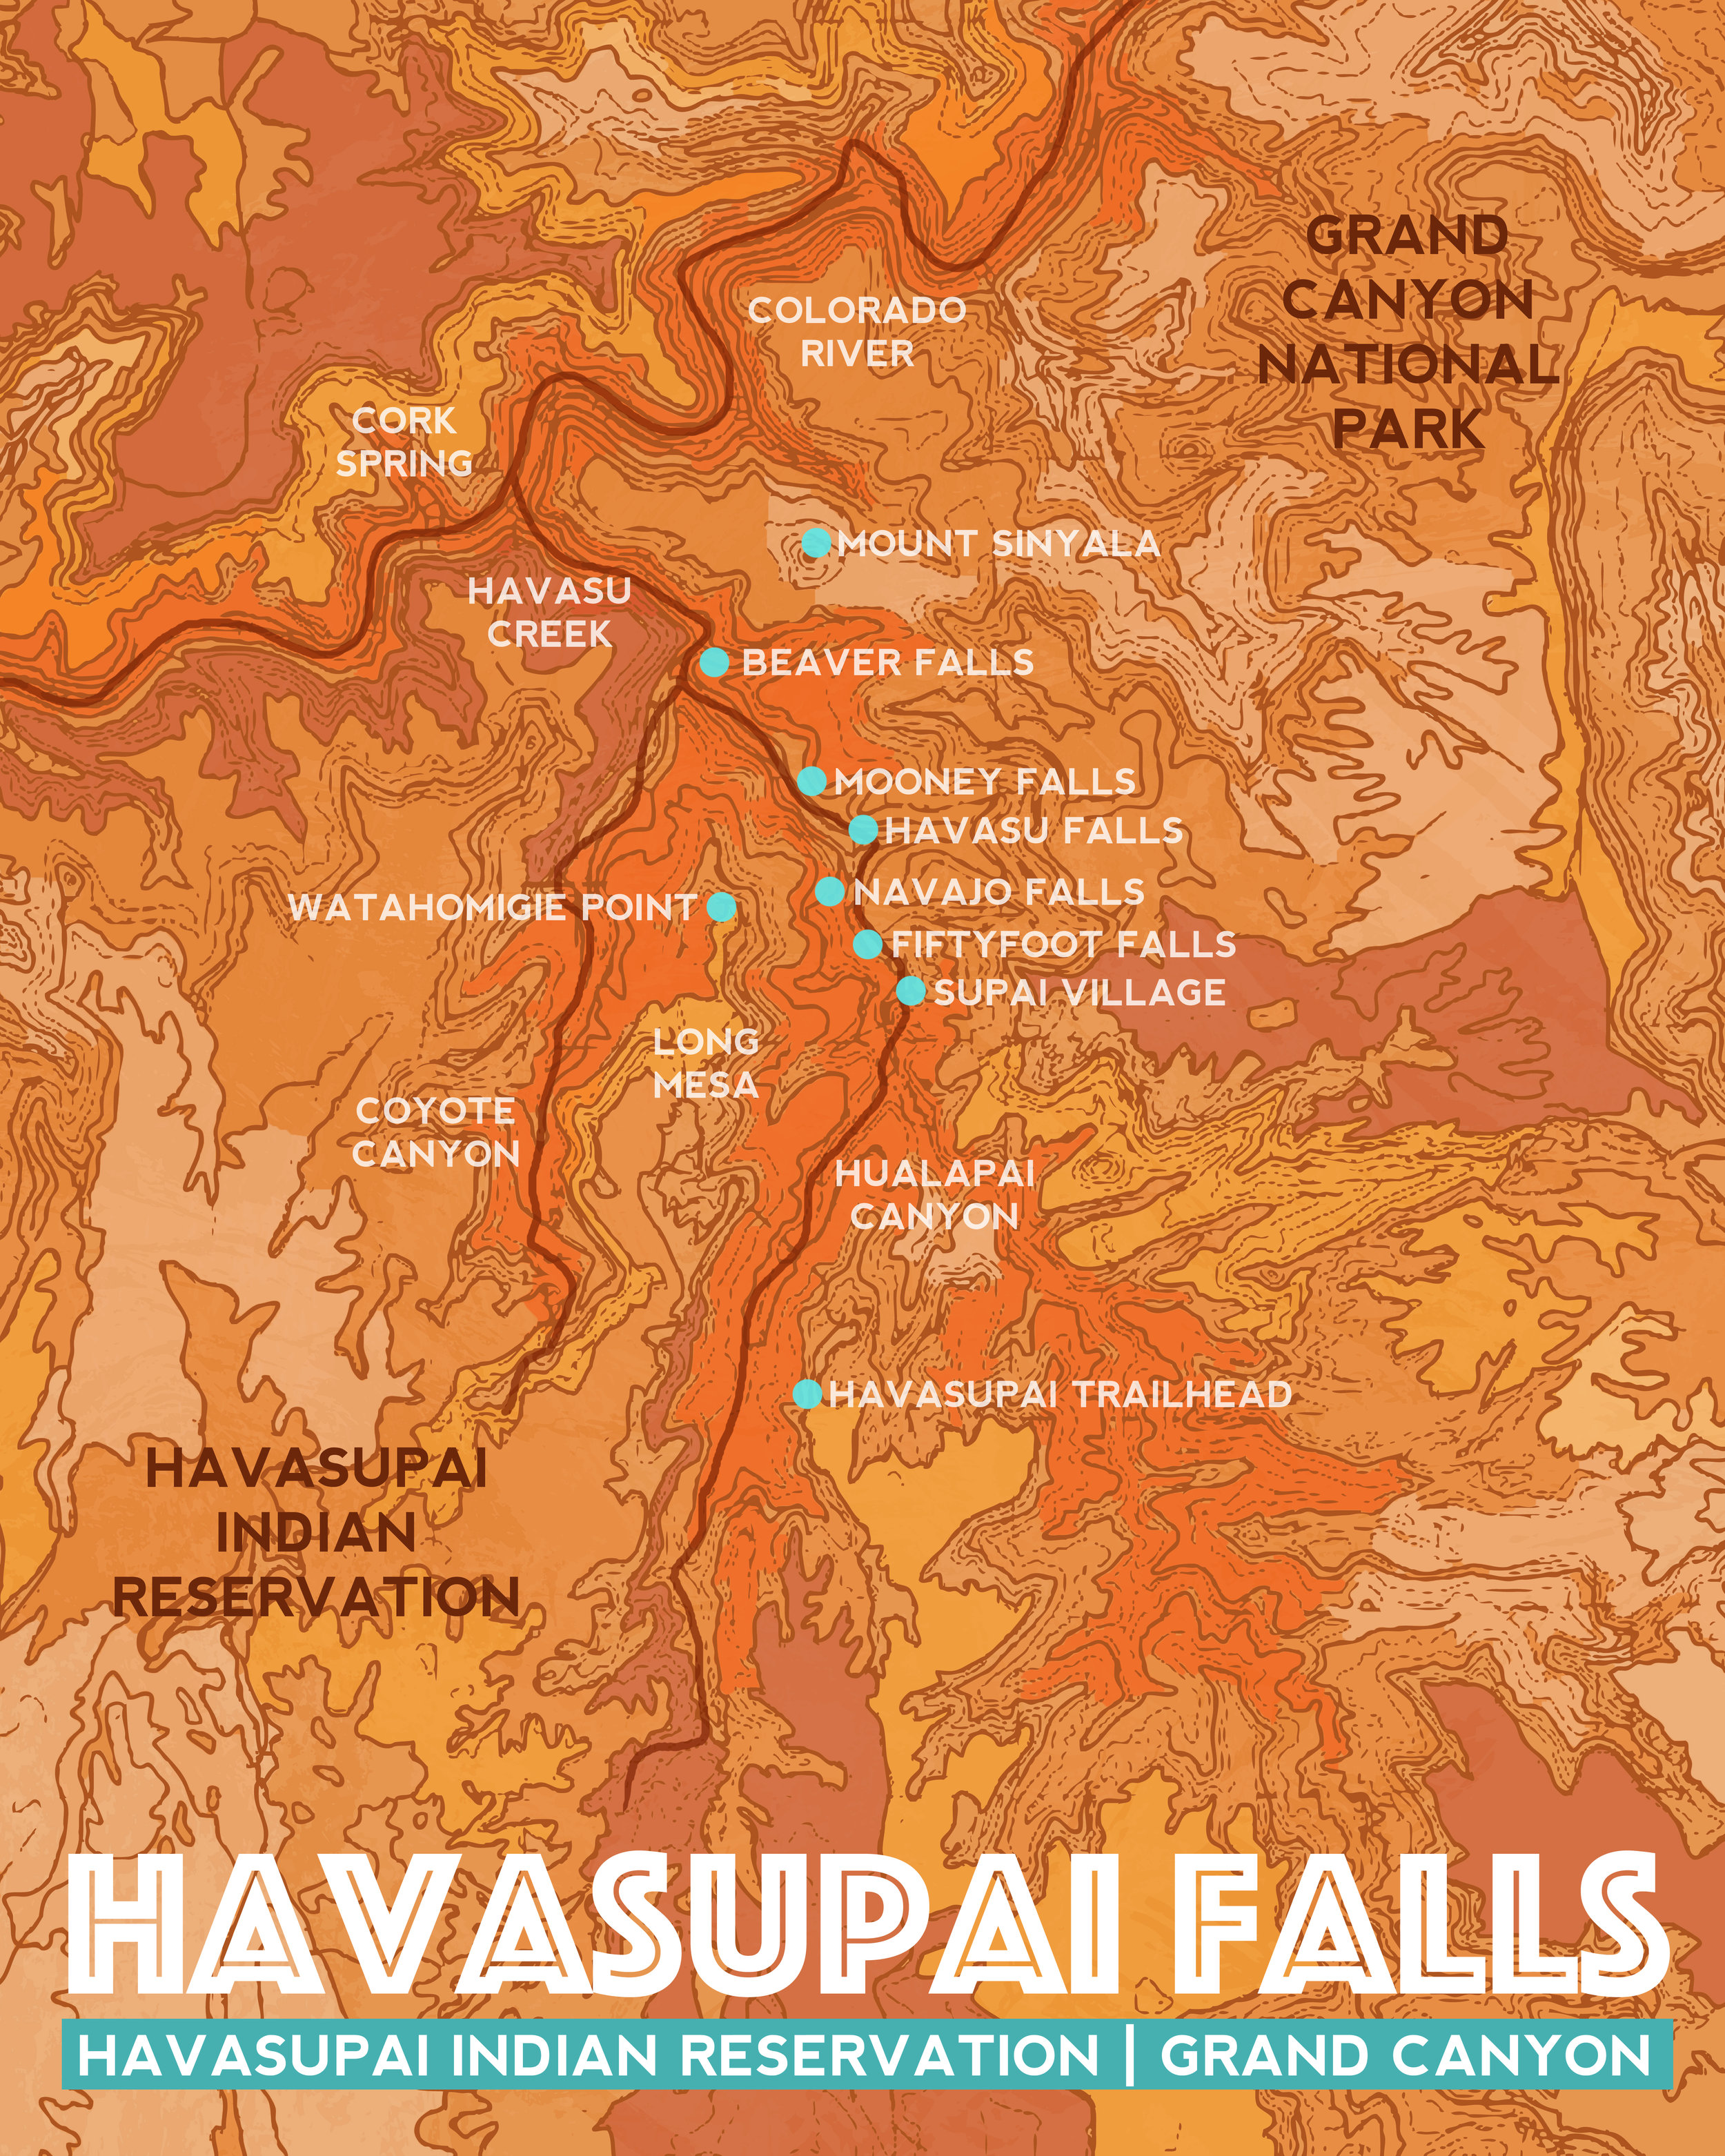 Havasupai Falls, 2018